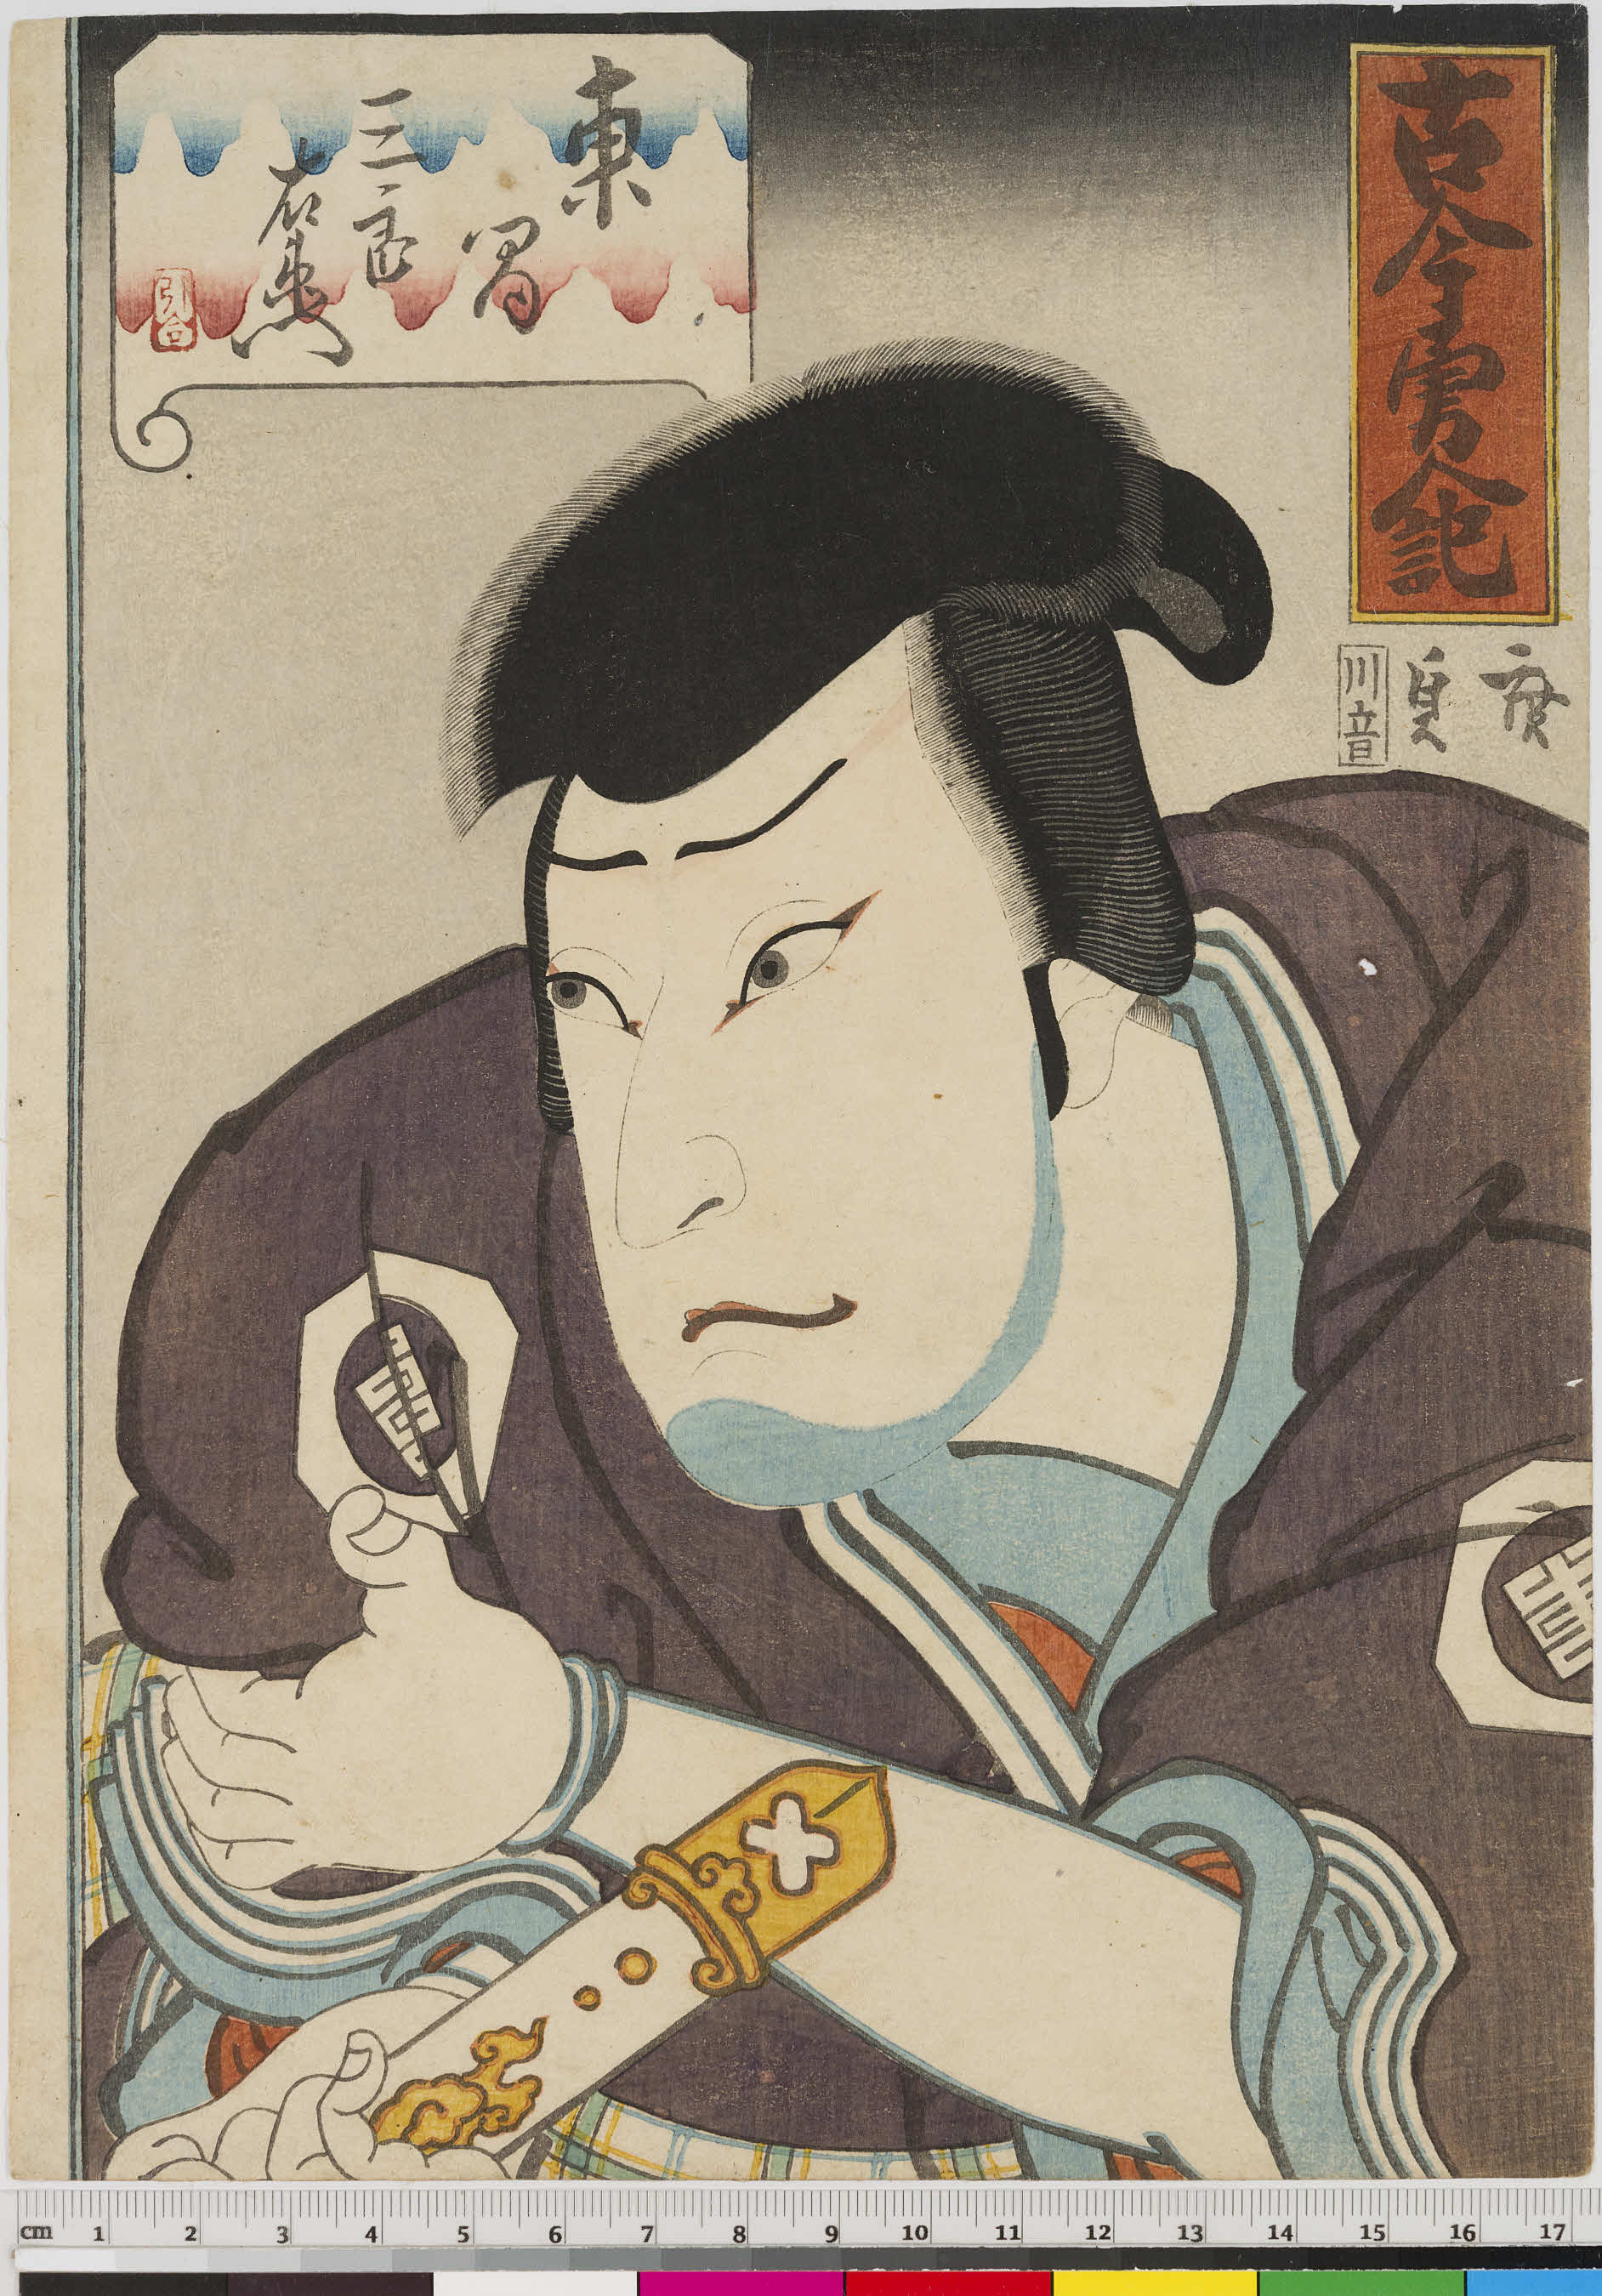 Osaka Prints Consortium